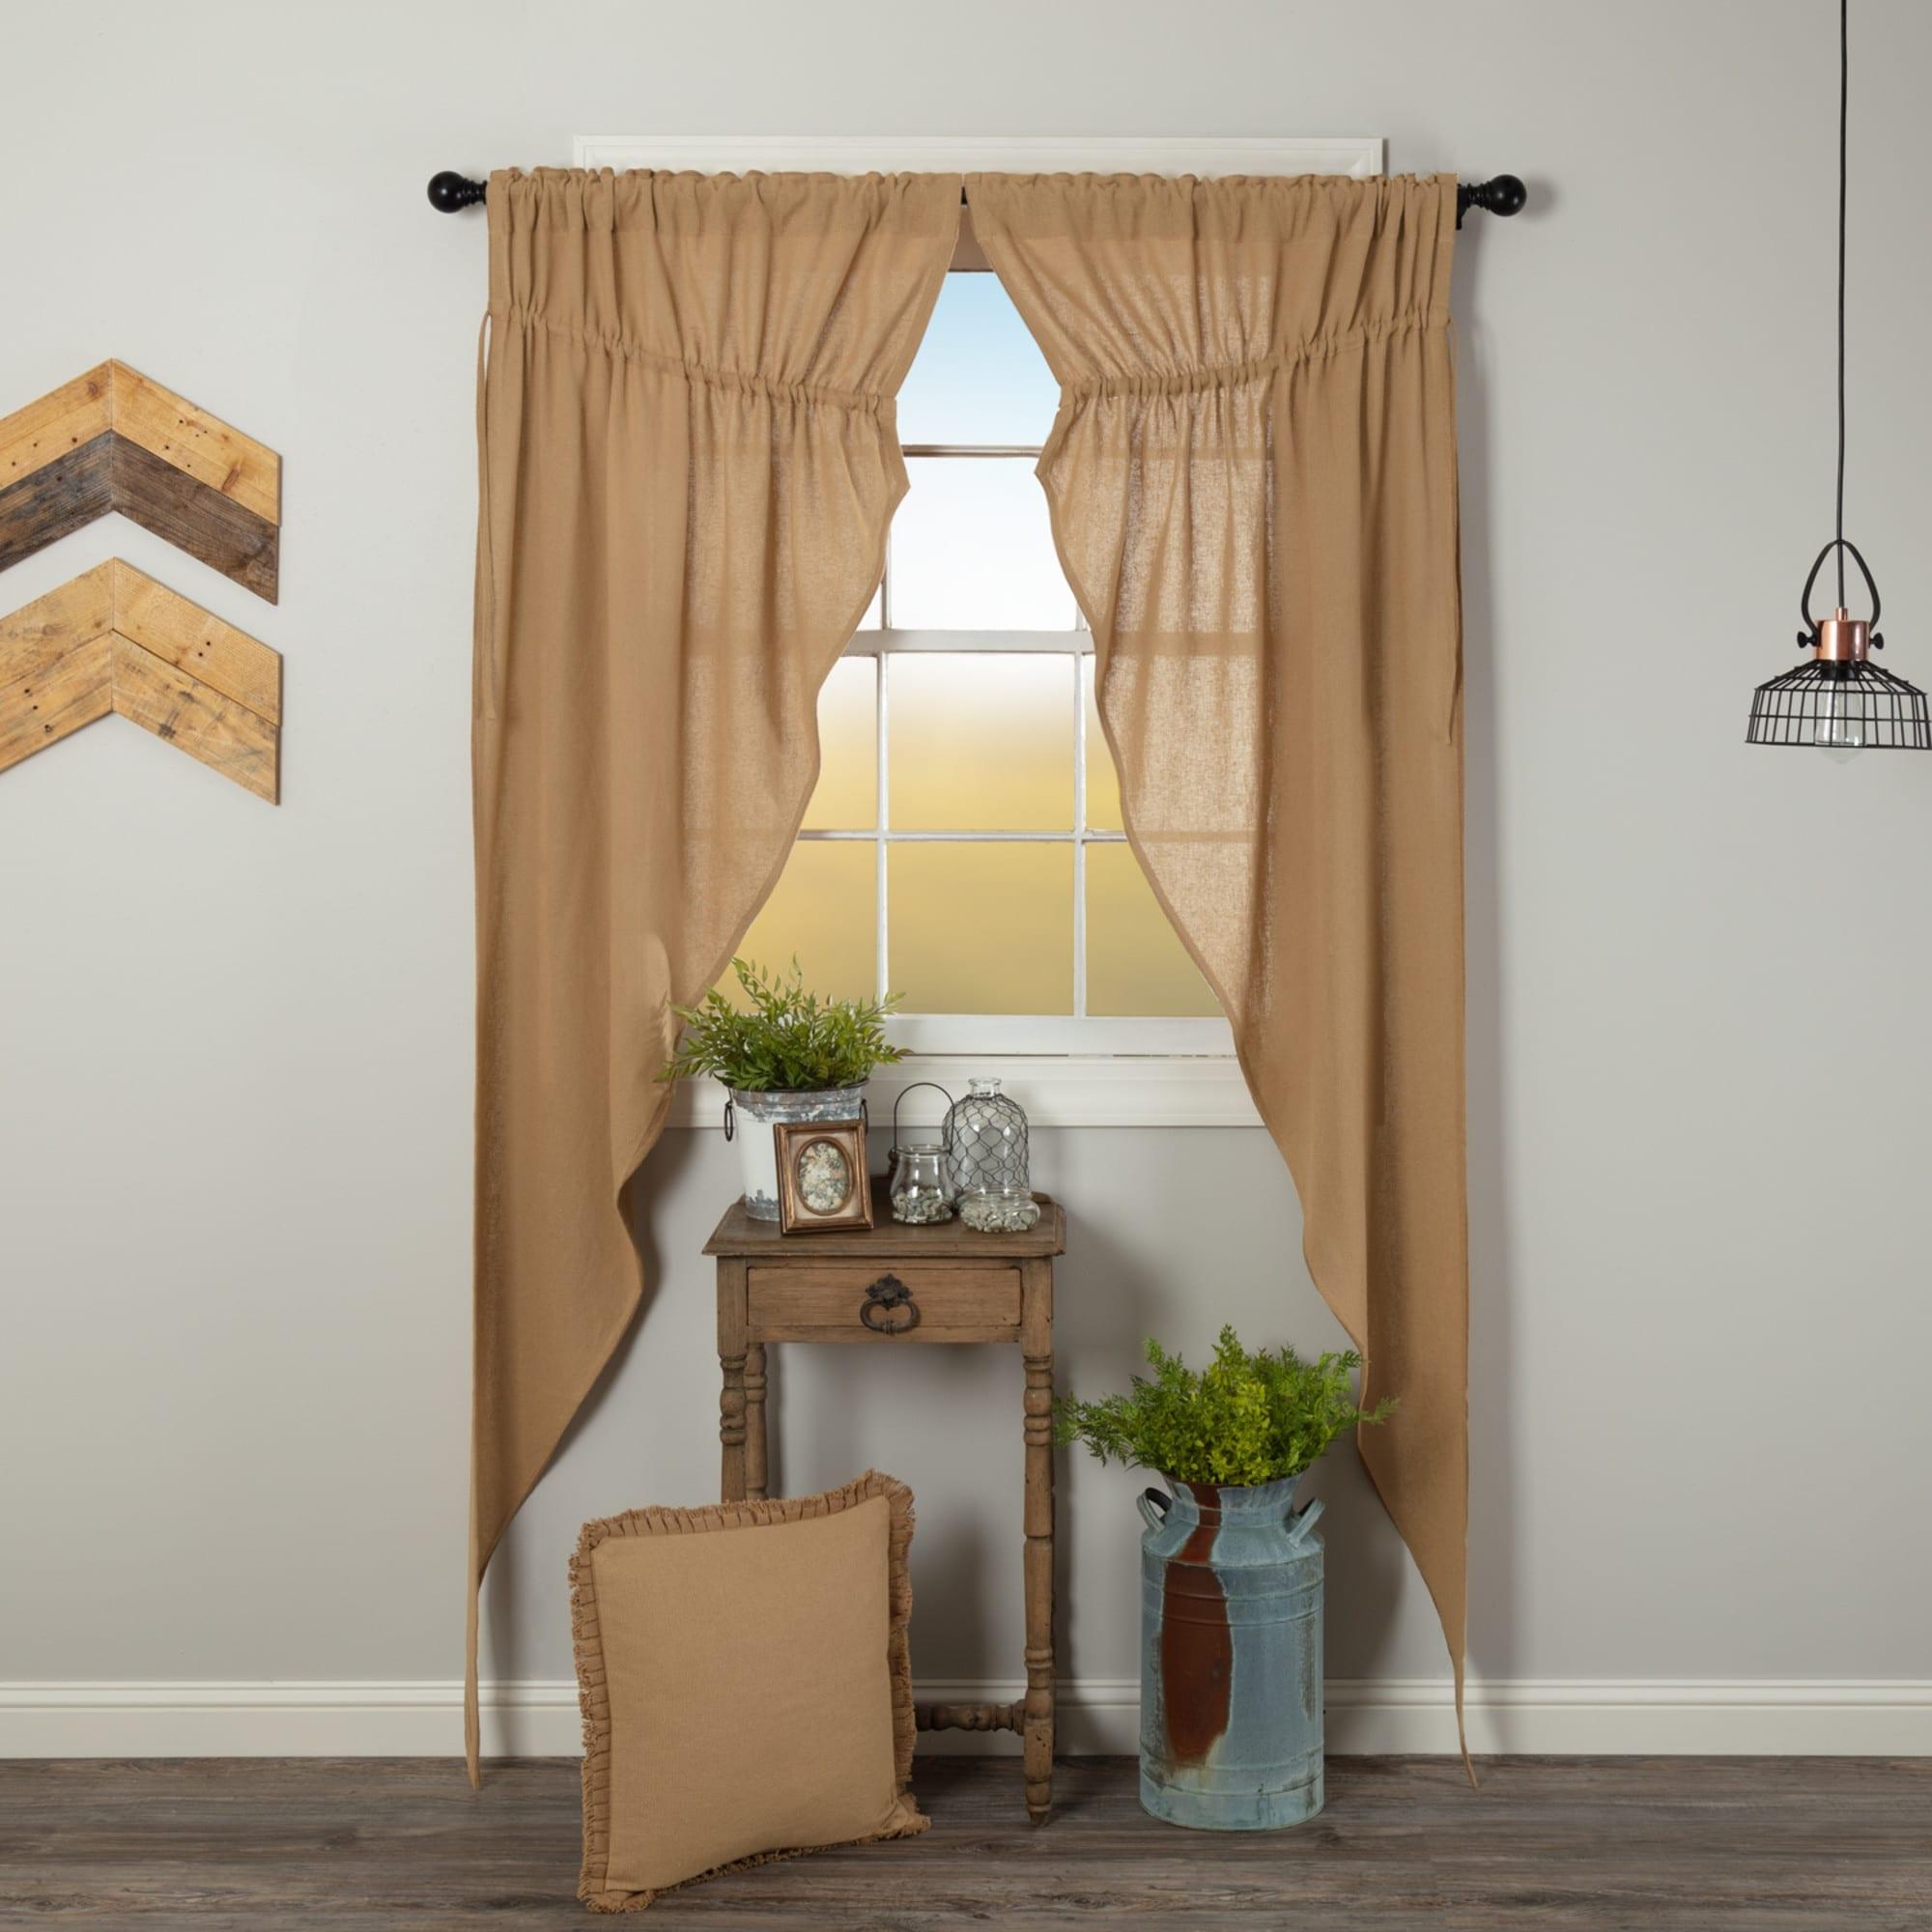 Rollos Gardinen Vorhange Vhc Farmhouse Country Prairie Curtain Set 2 Drapes Cotton Decorative Pick Color Mobel Wohnen Raizlatina Com Br